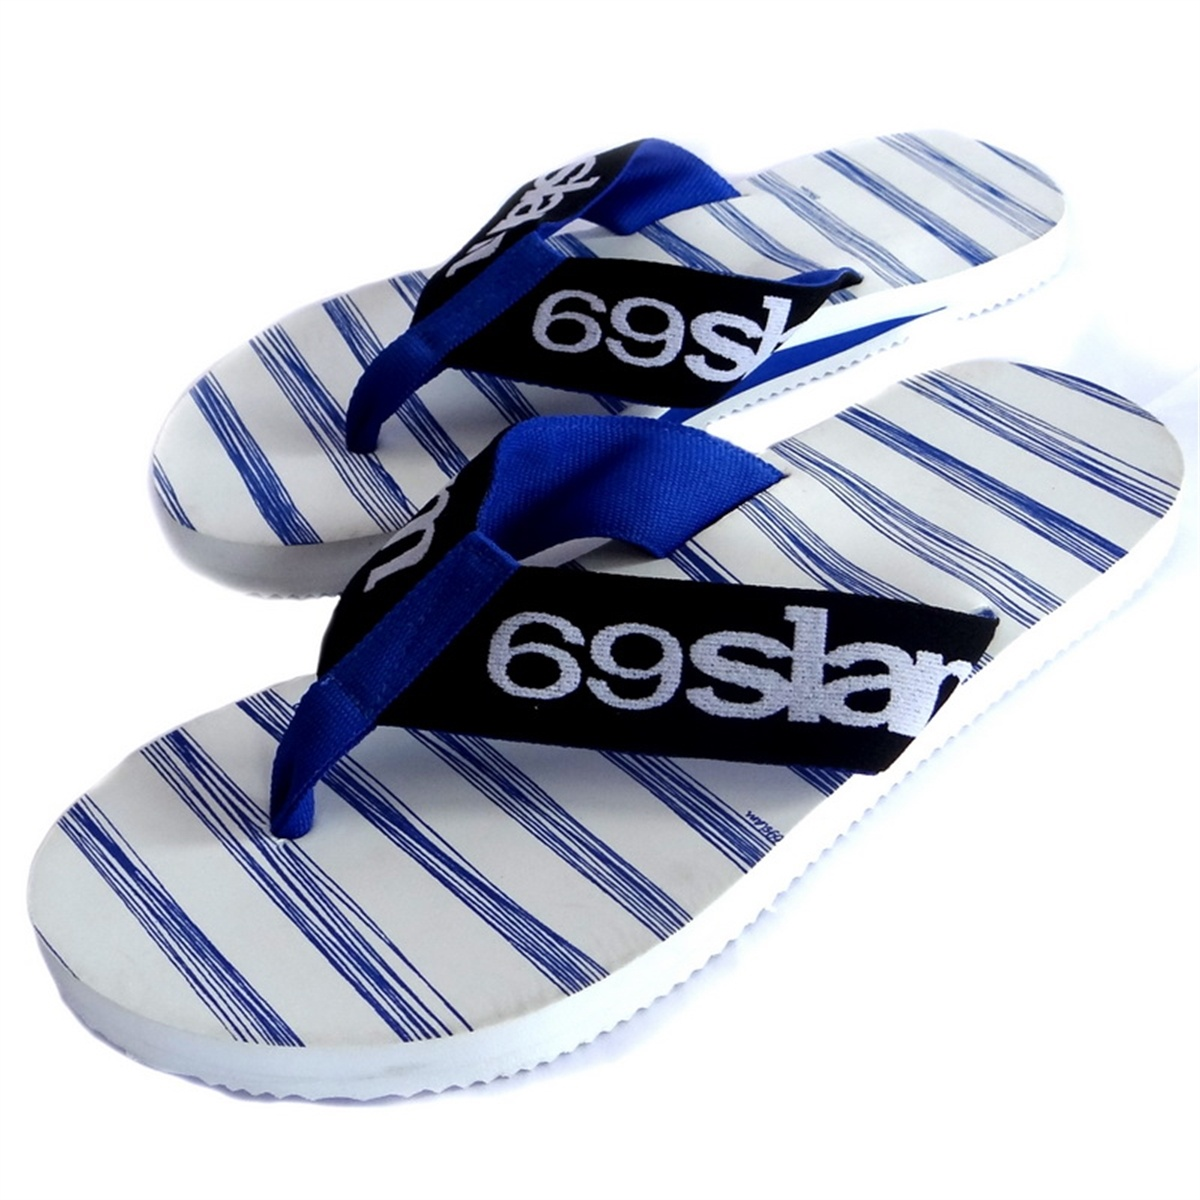 Pánské žabky 69SLAM Stripes Blue